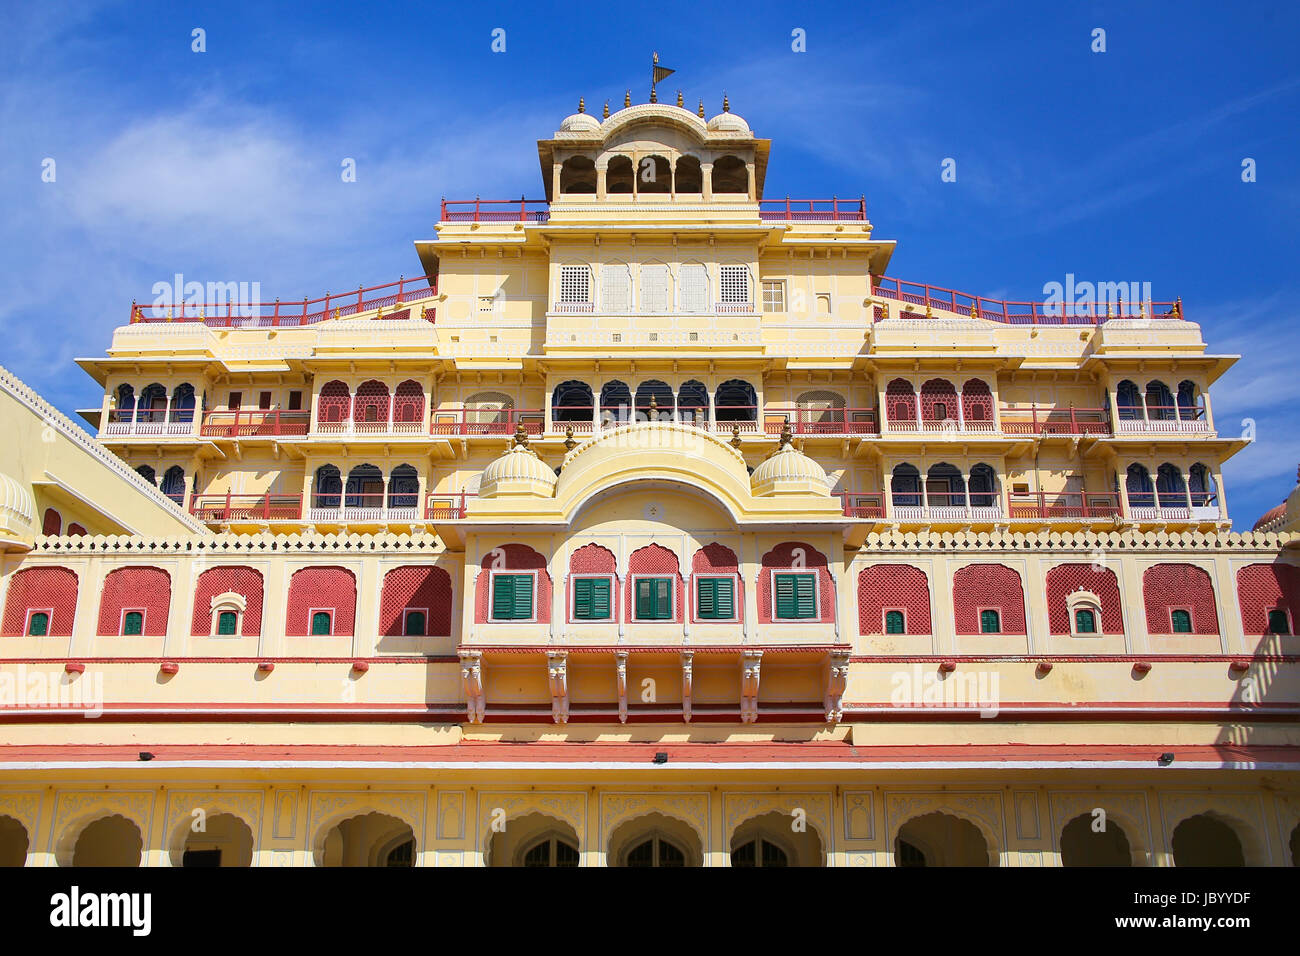 Chandra Mahal seen from Pitam Niwas Chowk, Jaipur City Palace, Rajasthan, India. Palace was the seat of the Maharaja Stock Photo